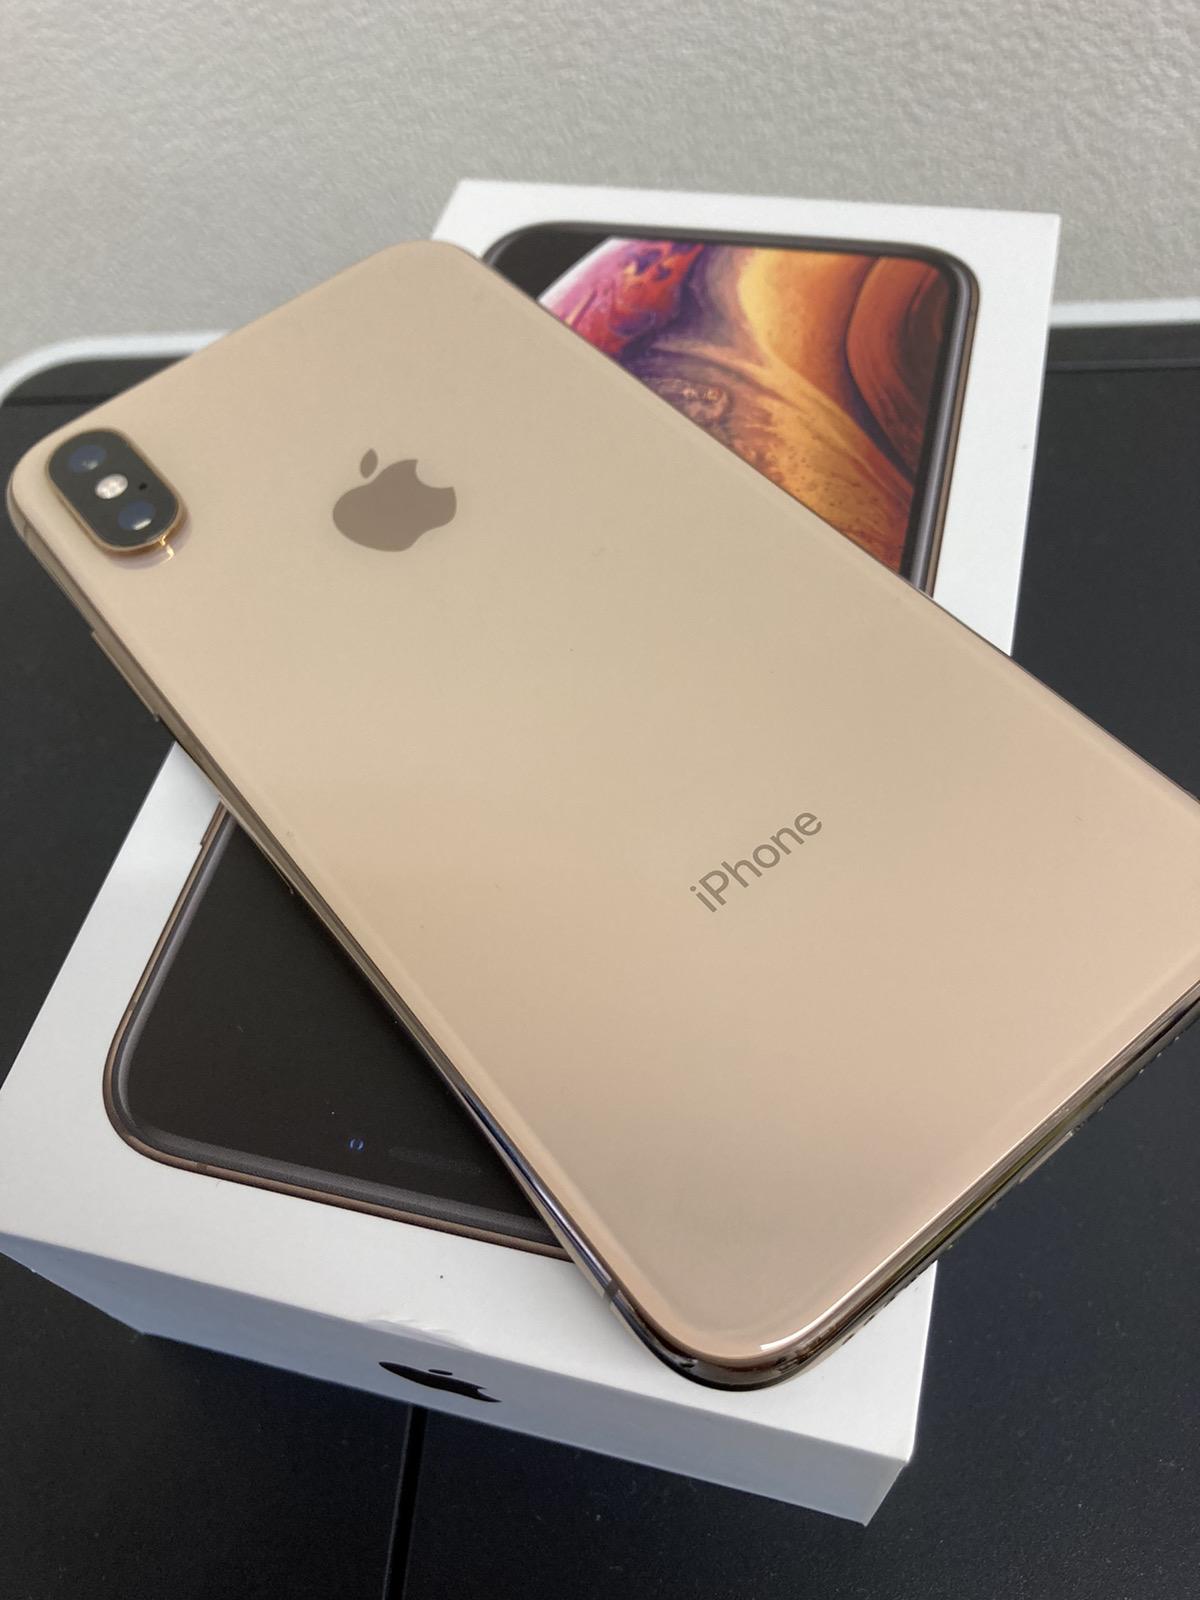 iPhoneXs 256GB SIMフリー